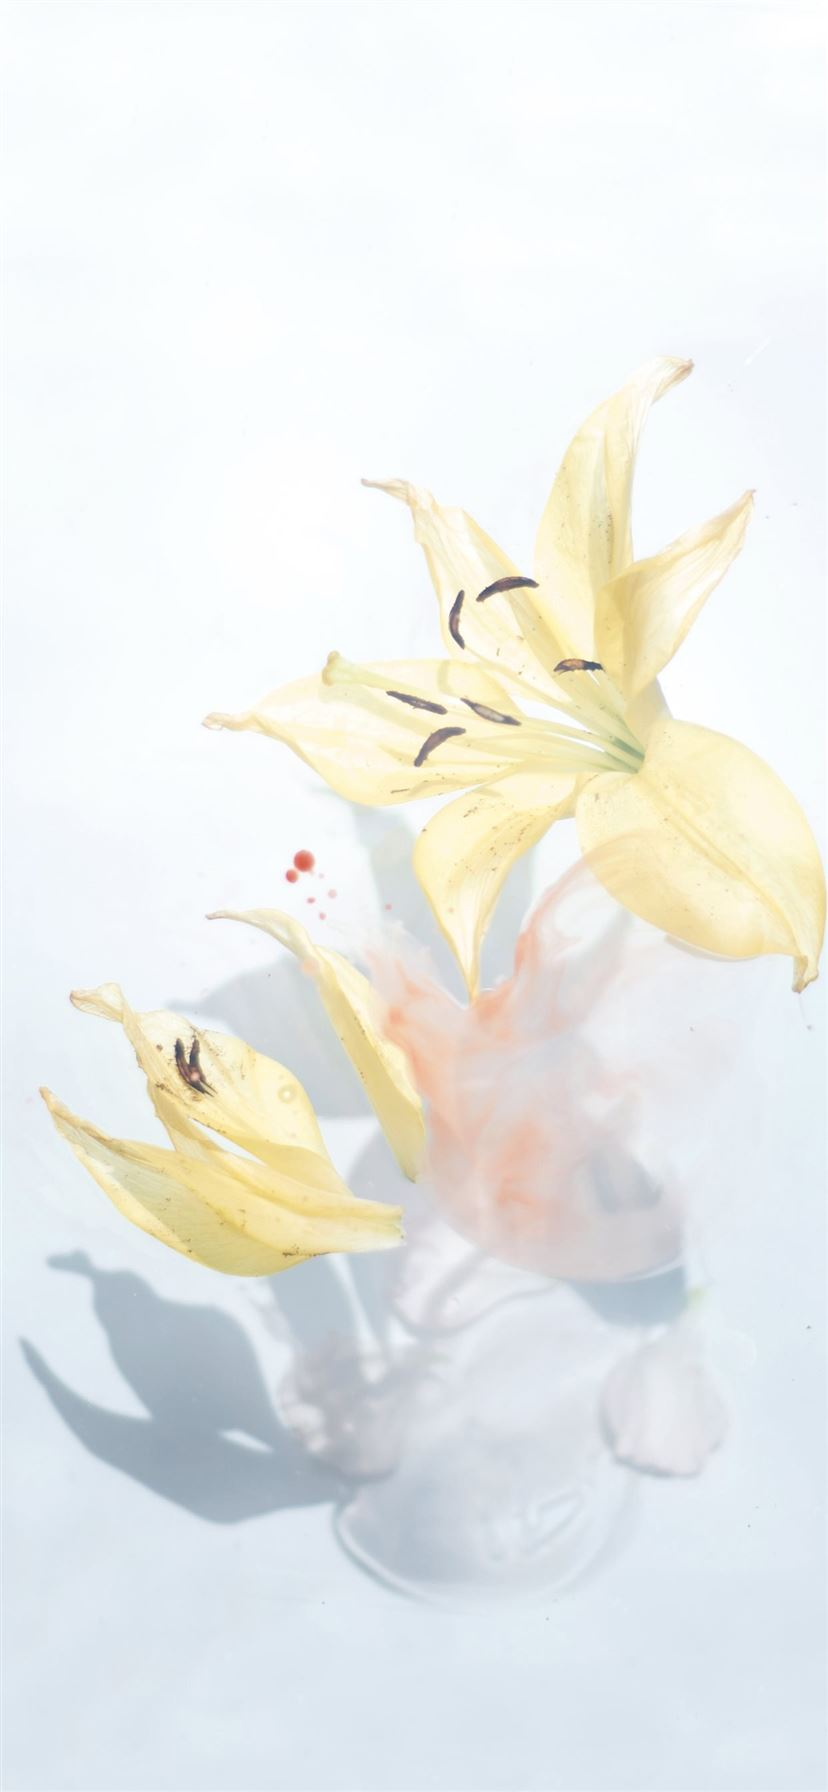 Best White Iphone 11 Wallpapers Hd Ilikewallpaper